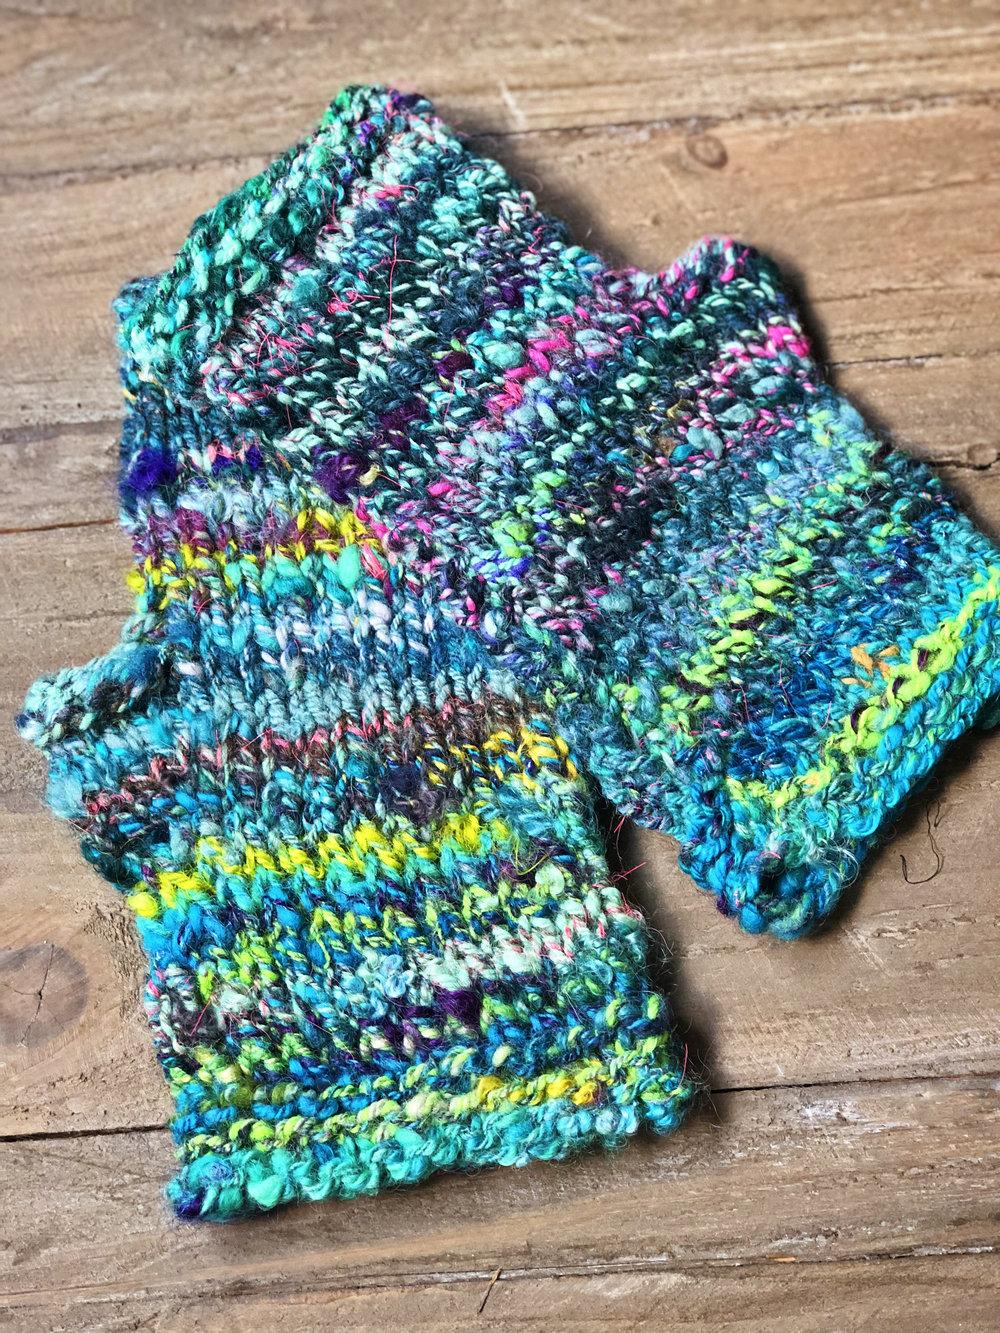 Taylor Chona knit mitts 222 handspun samples2.jpg